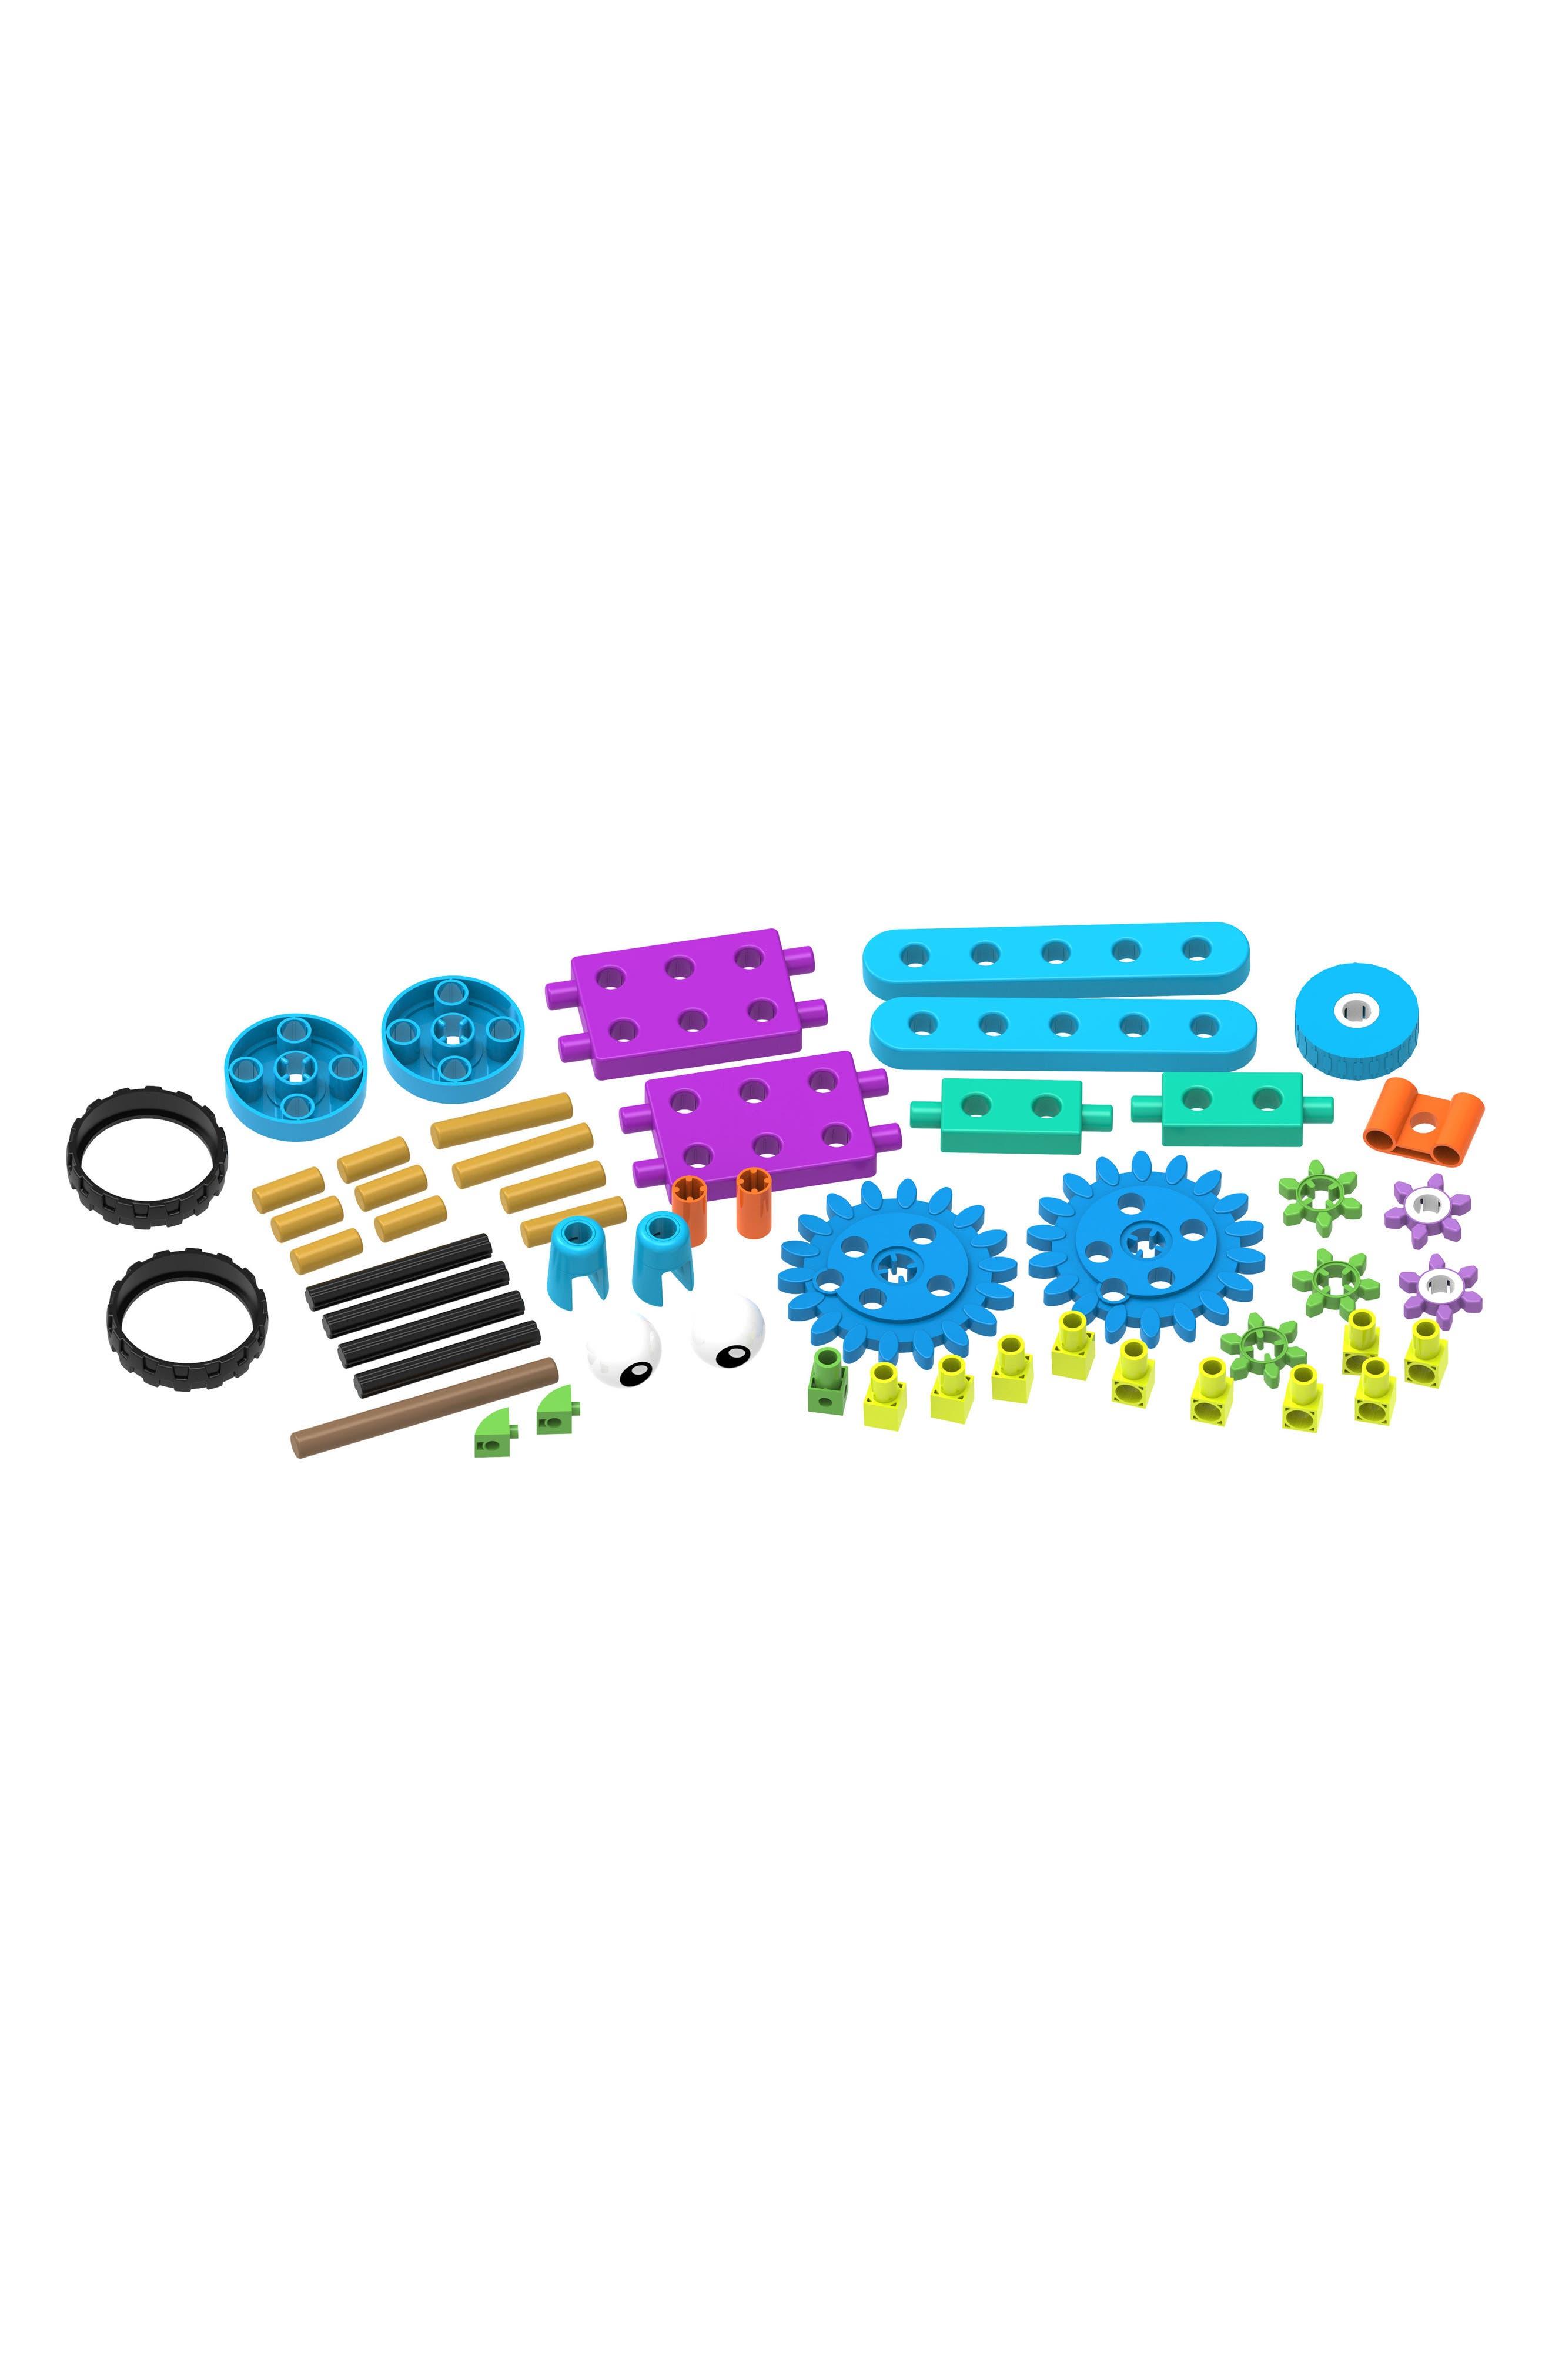 Robot Engineer Building Set & Storybook,                             Alternate thumbnail 10, color,                             Blue